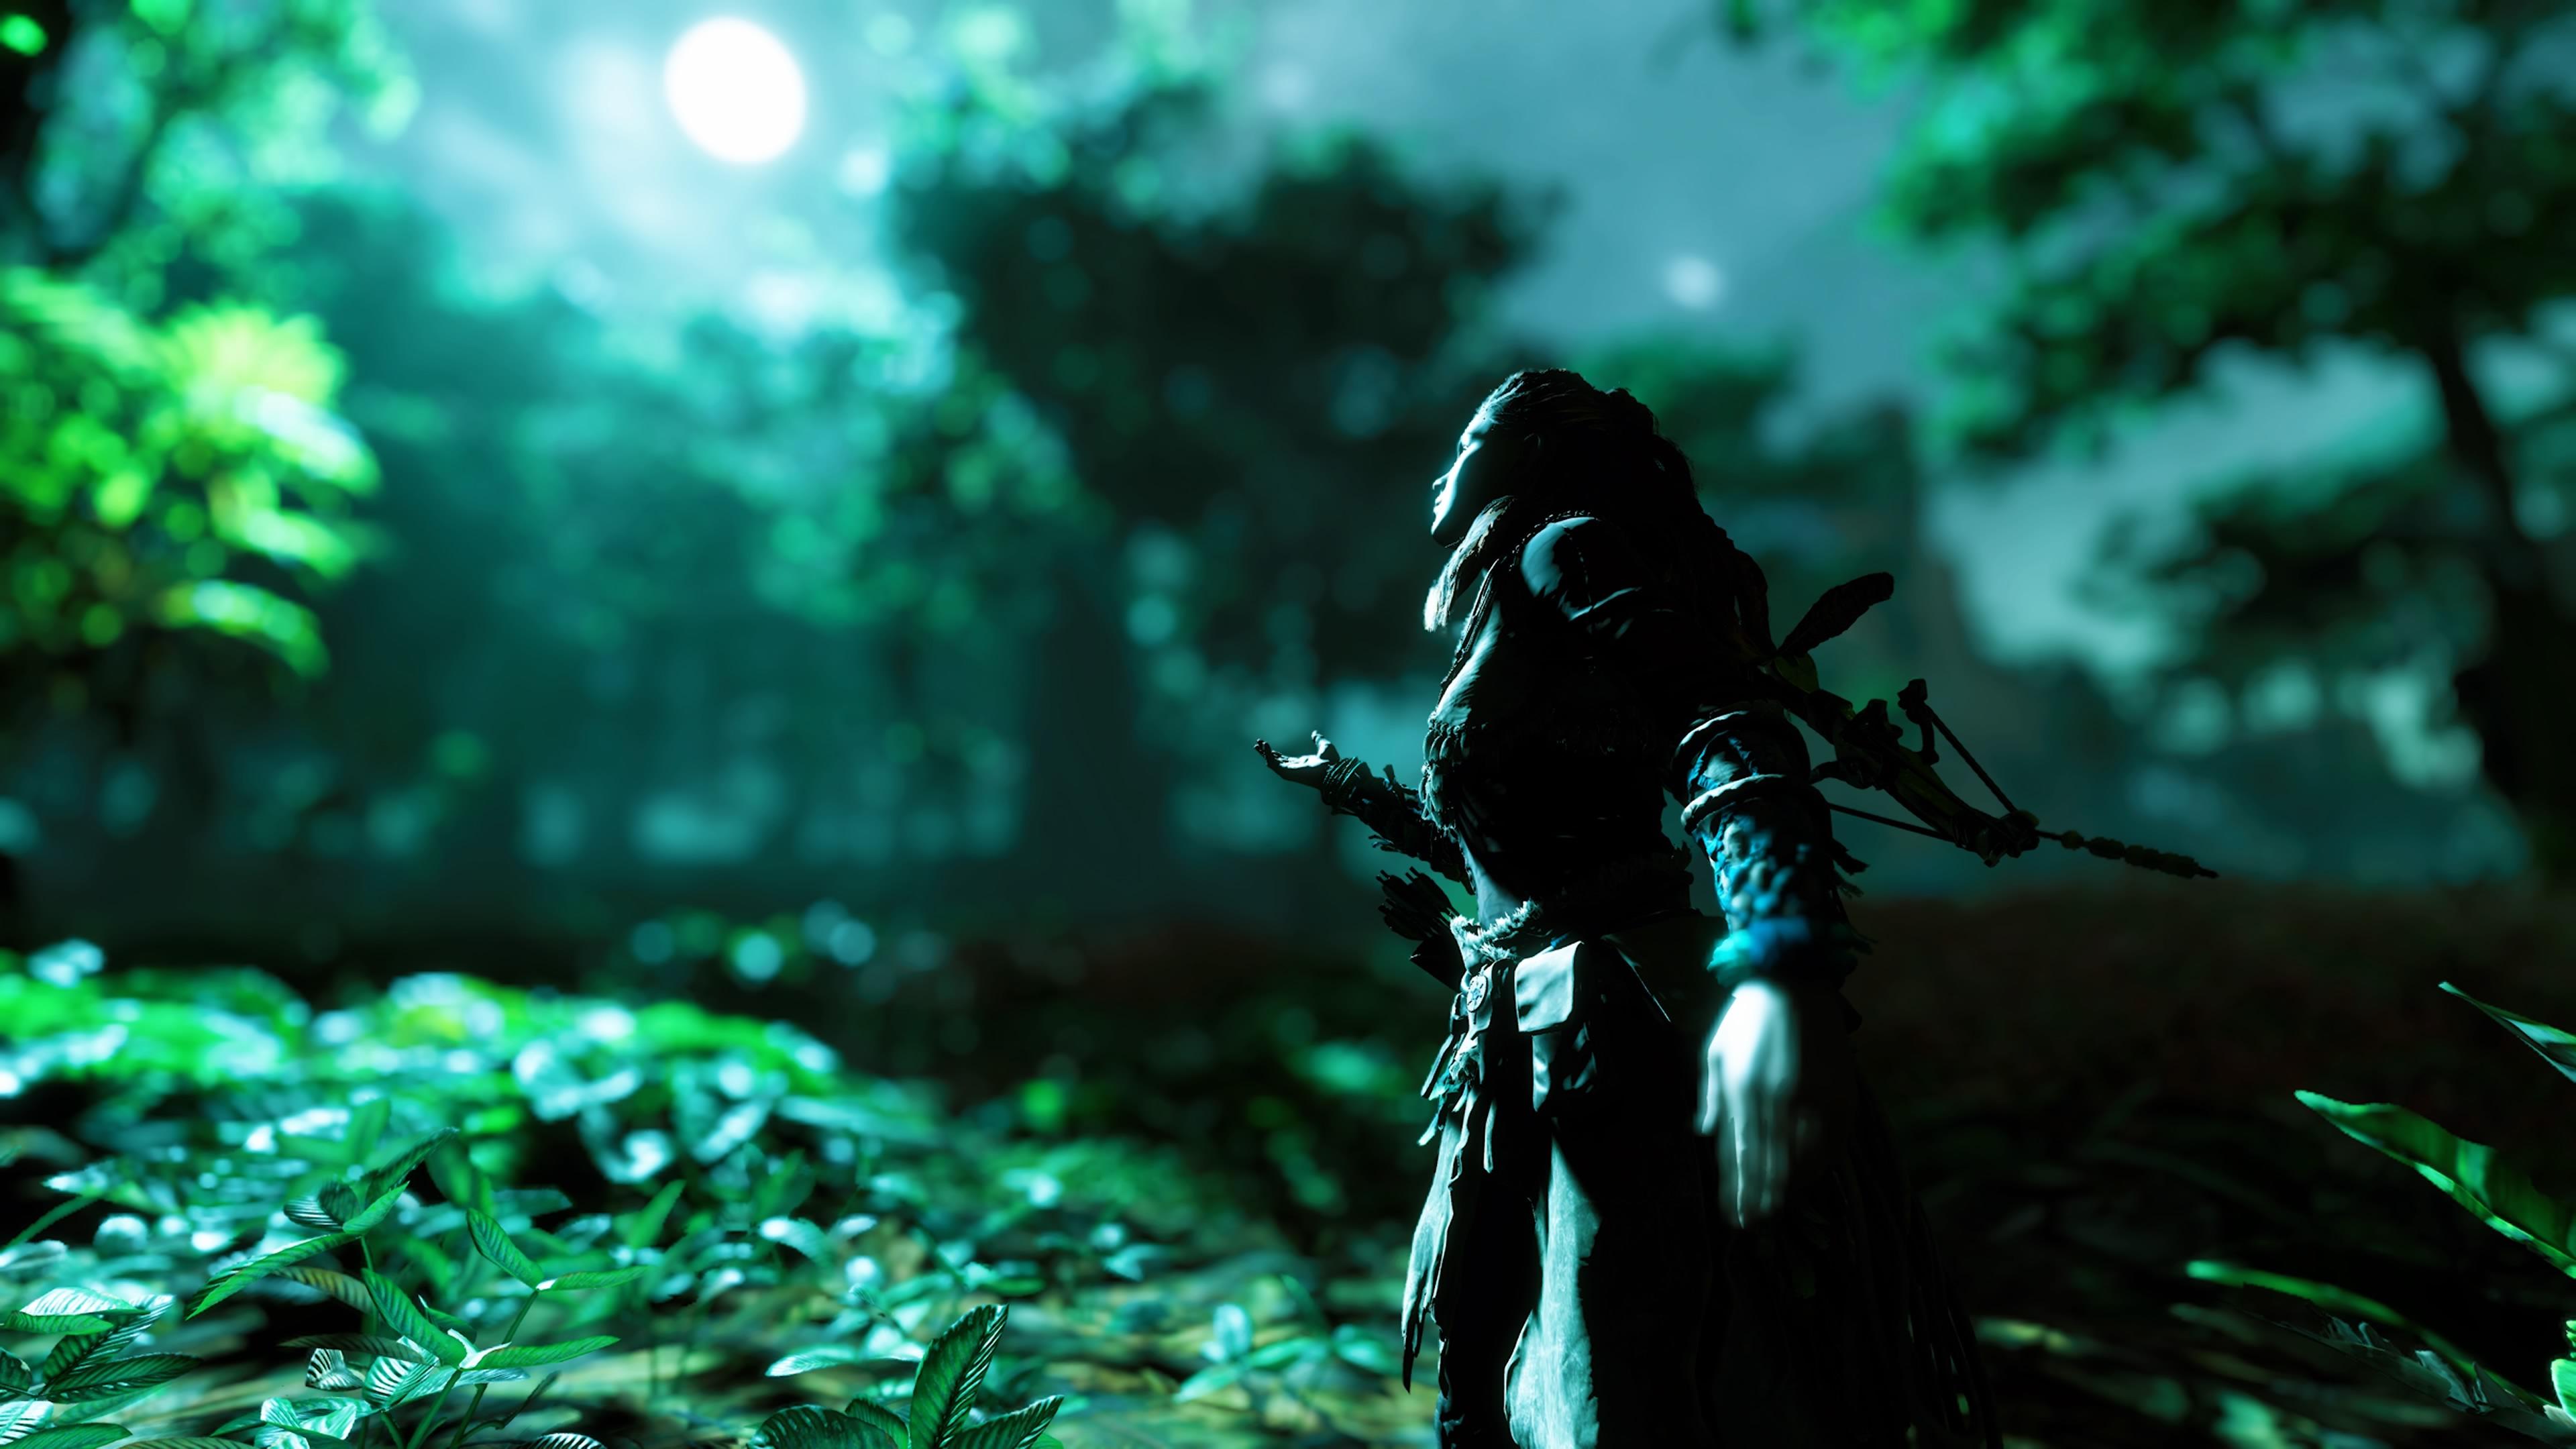 Wallpaper Horizon Zero Dawn 4k Video Games Digital Art